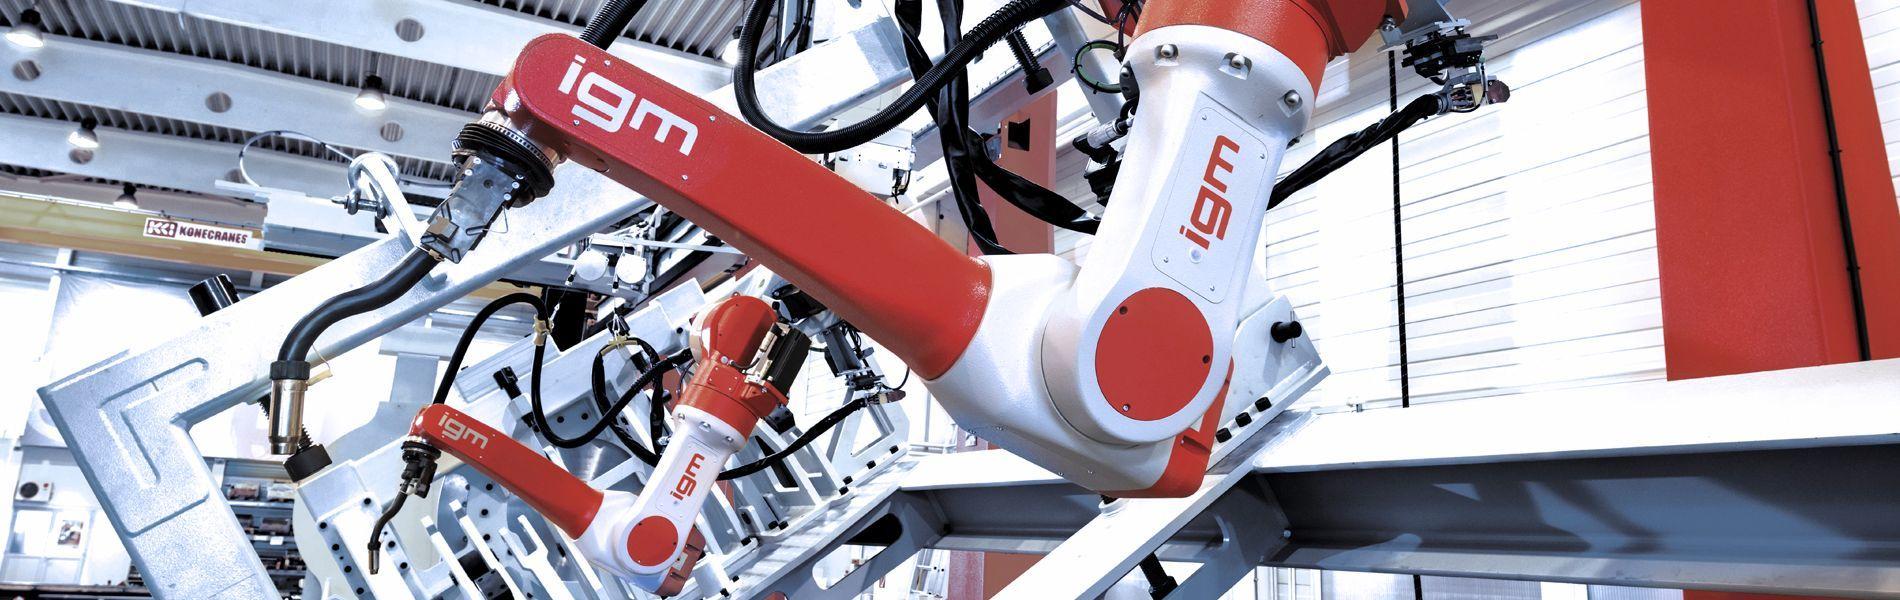 rotator-4